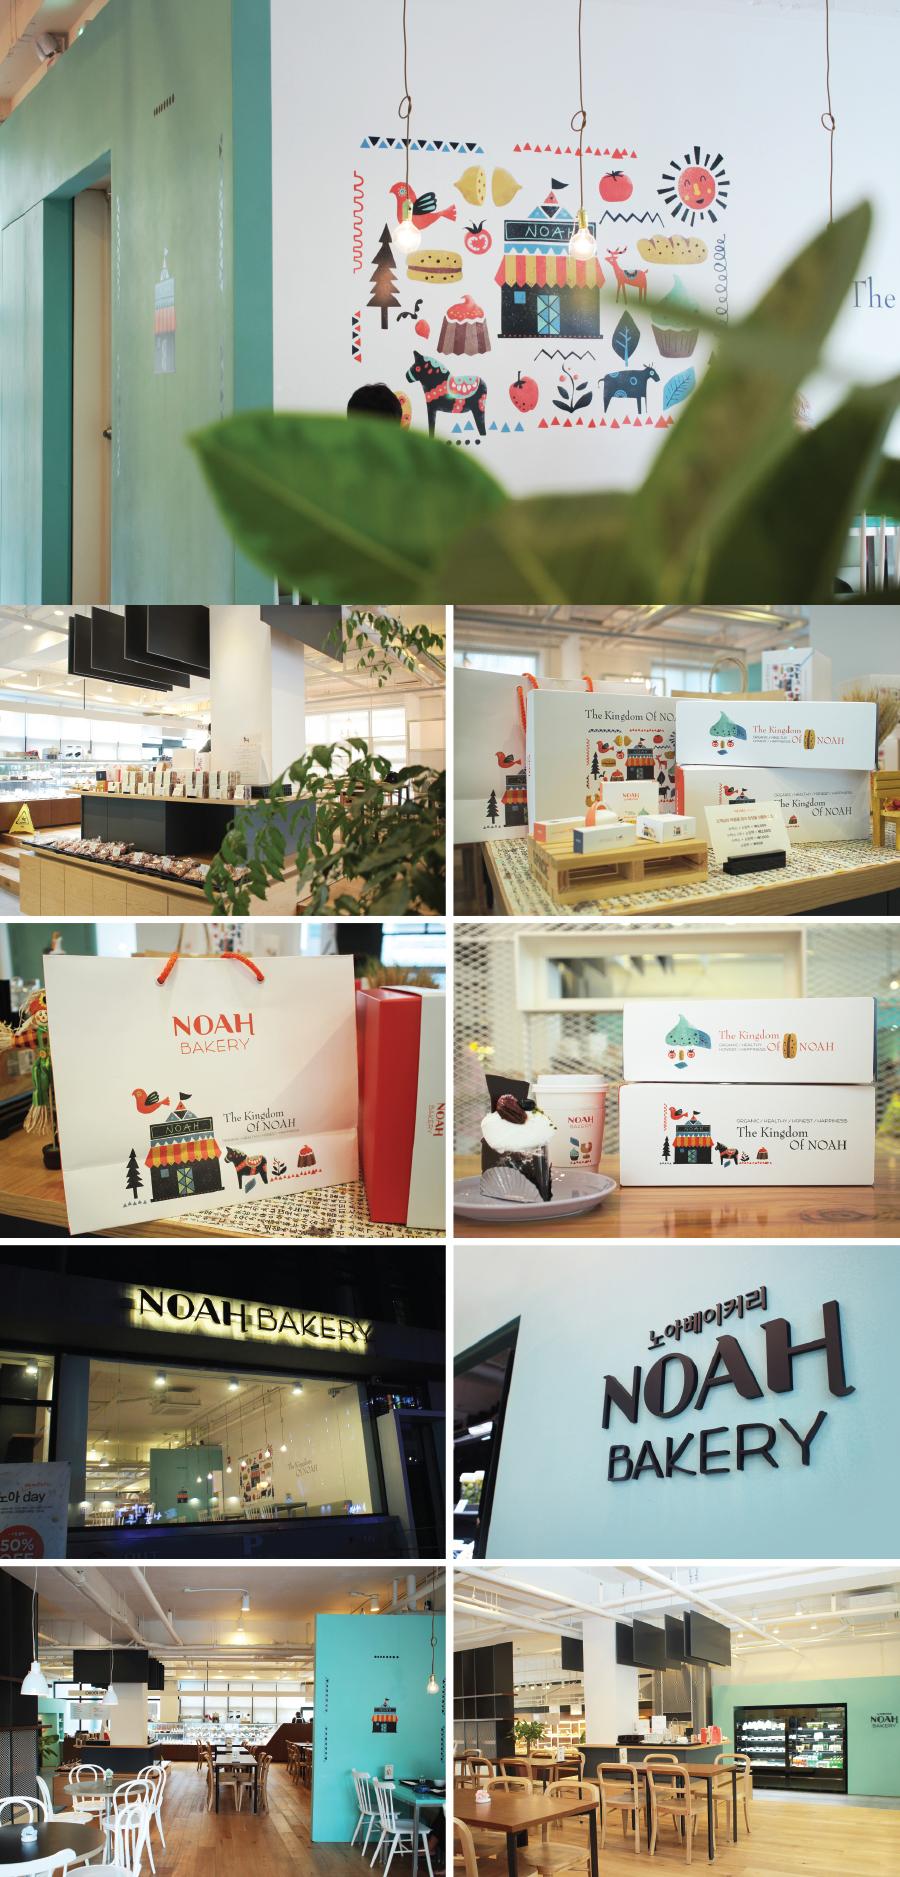 NOAH-Bakery-si-total-900_04